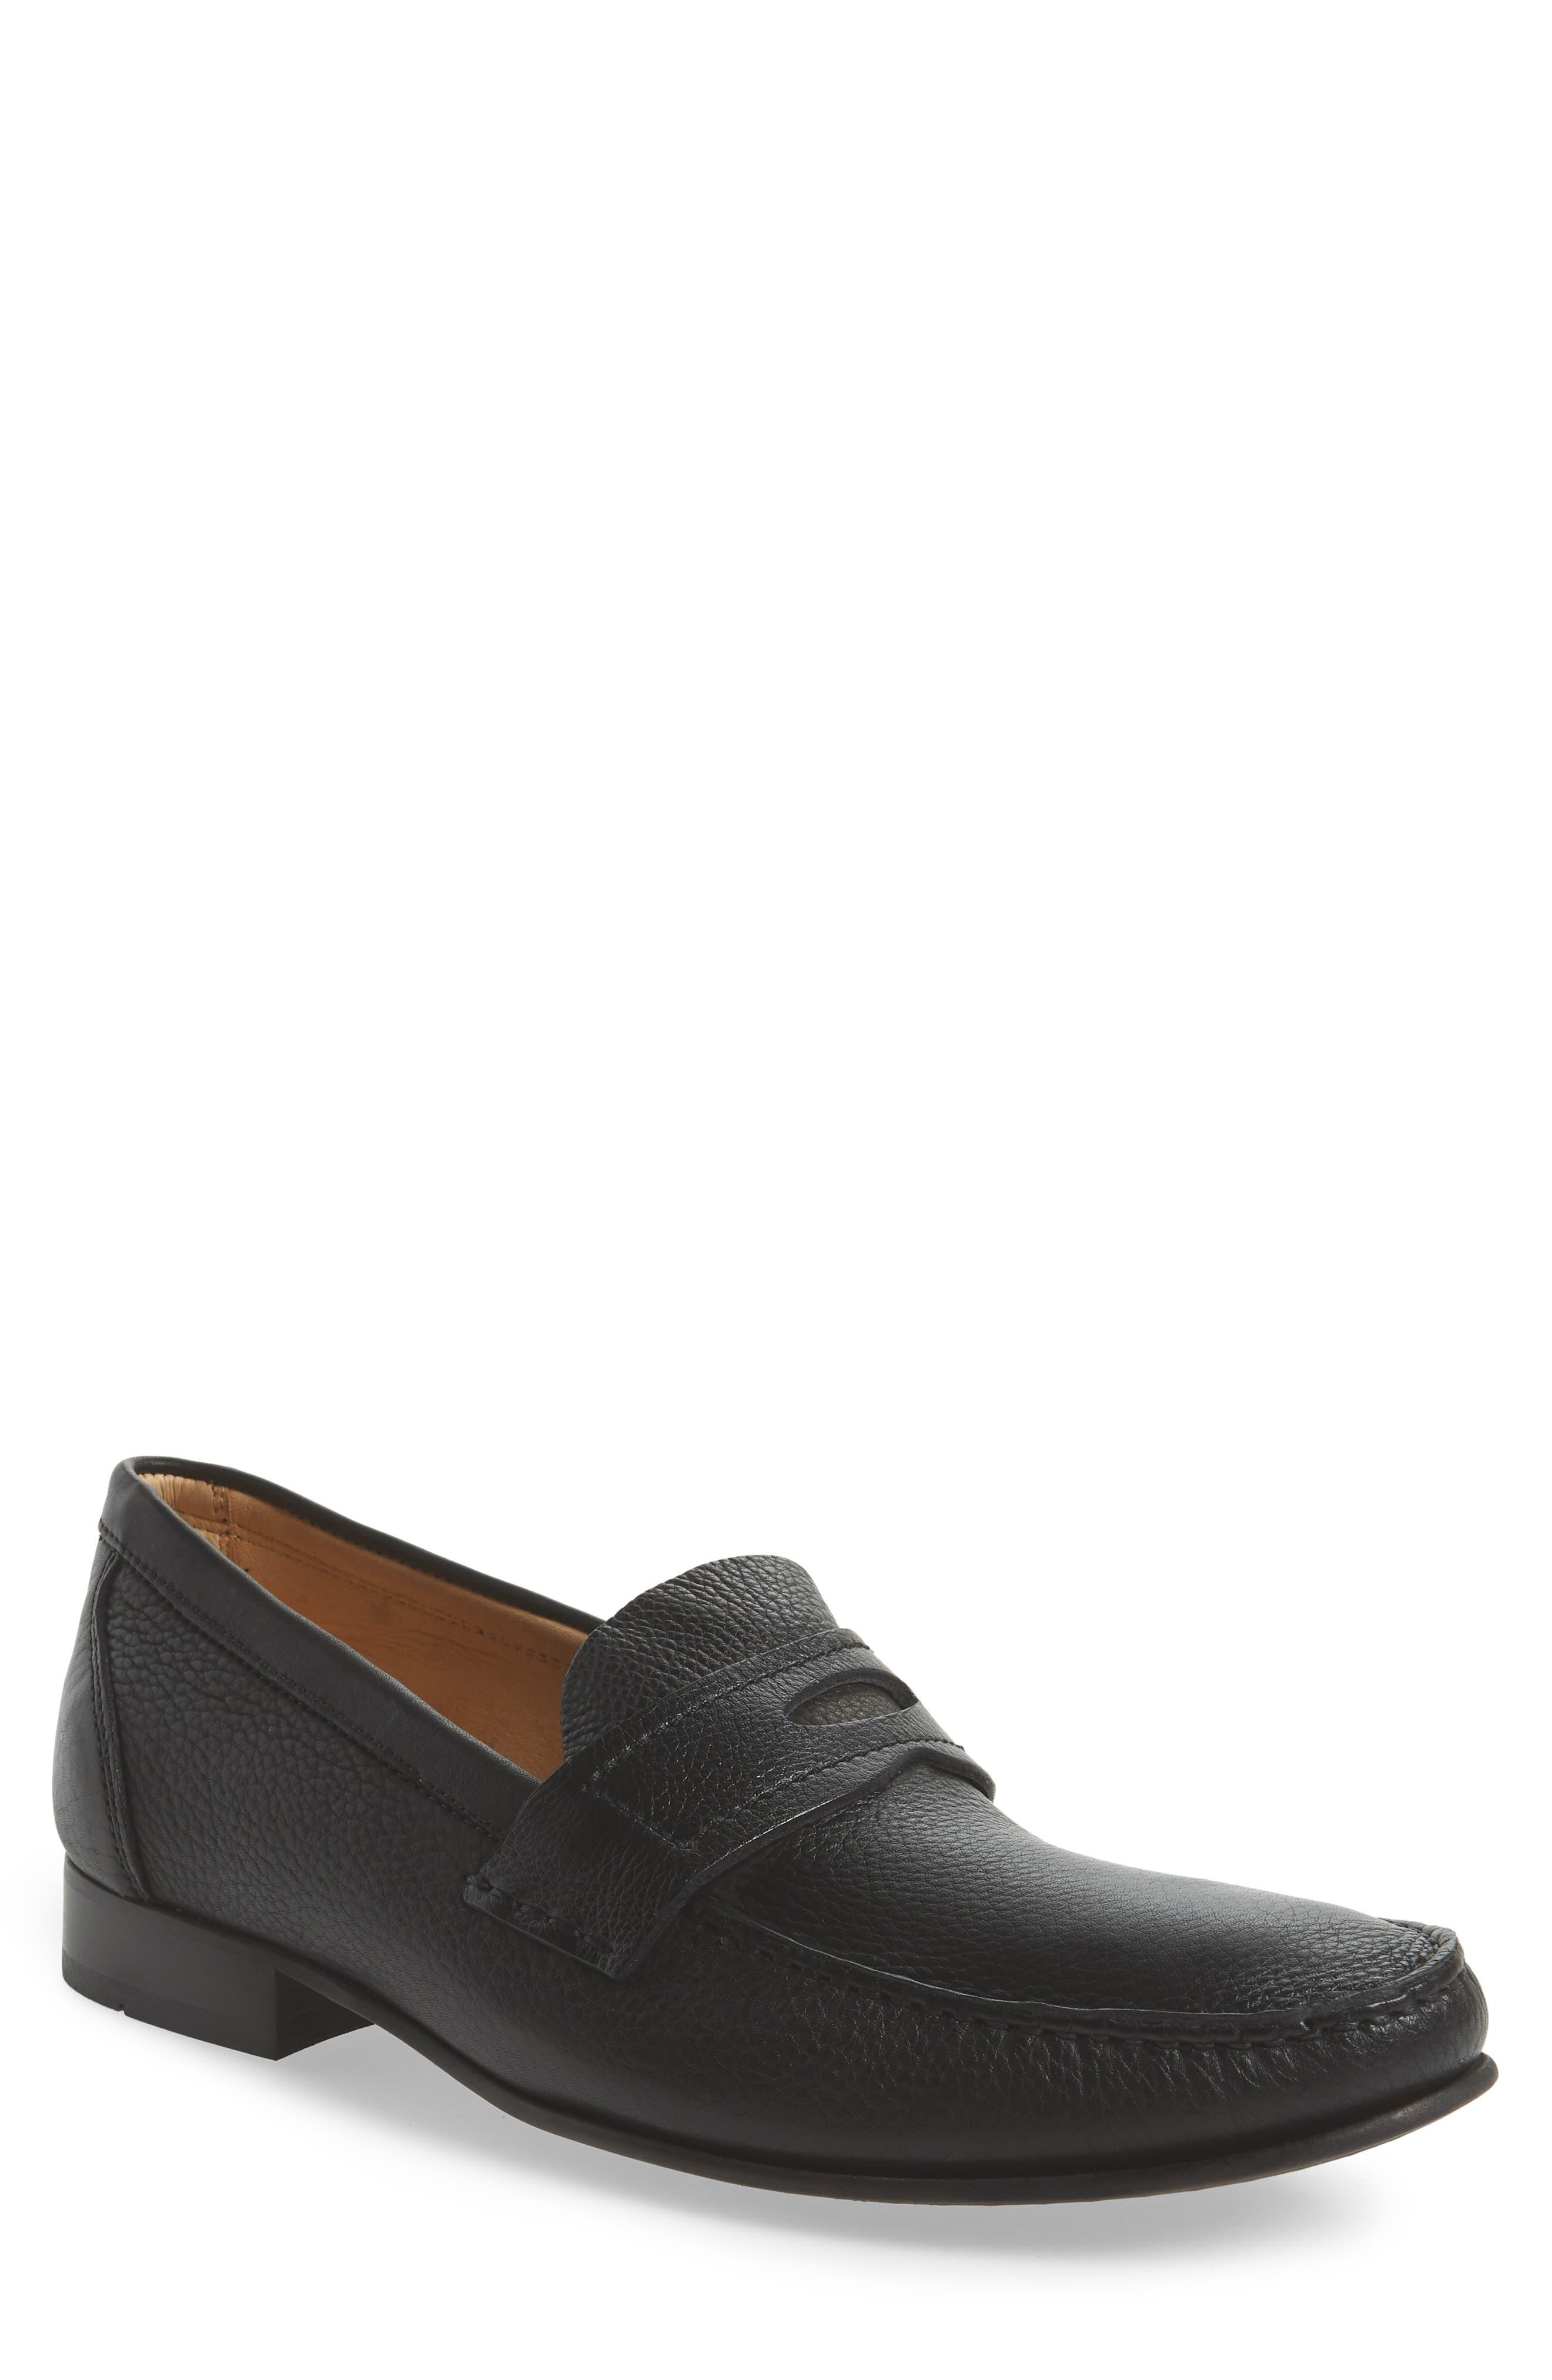 Eric Moc Toe Slip-On Loafer,                             Main thumbnail 1, color,                             Floater Black Leather